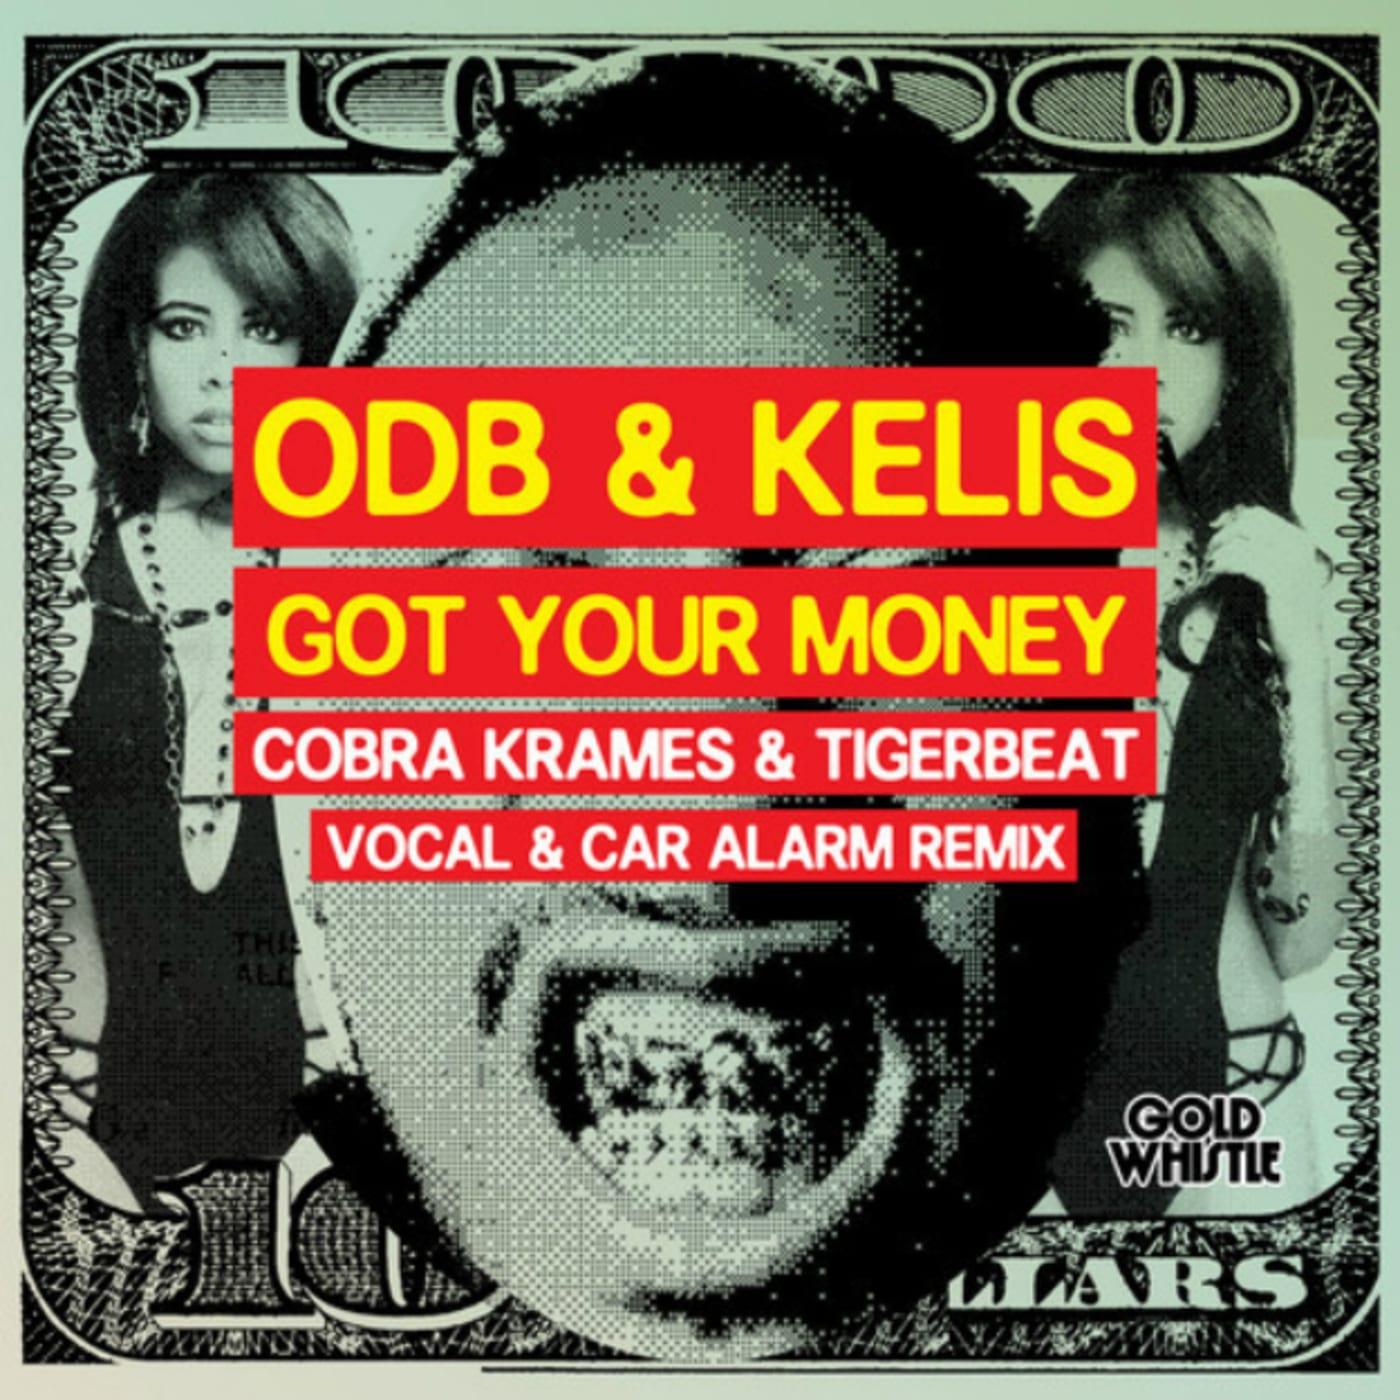 got your money remixes